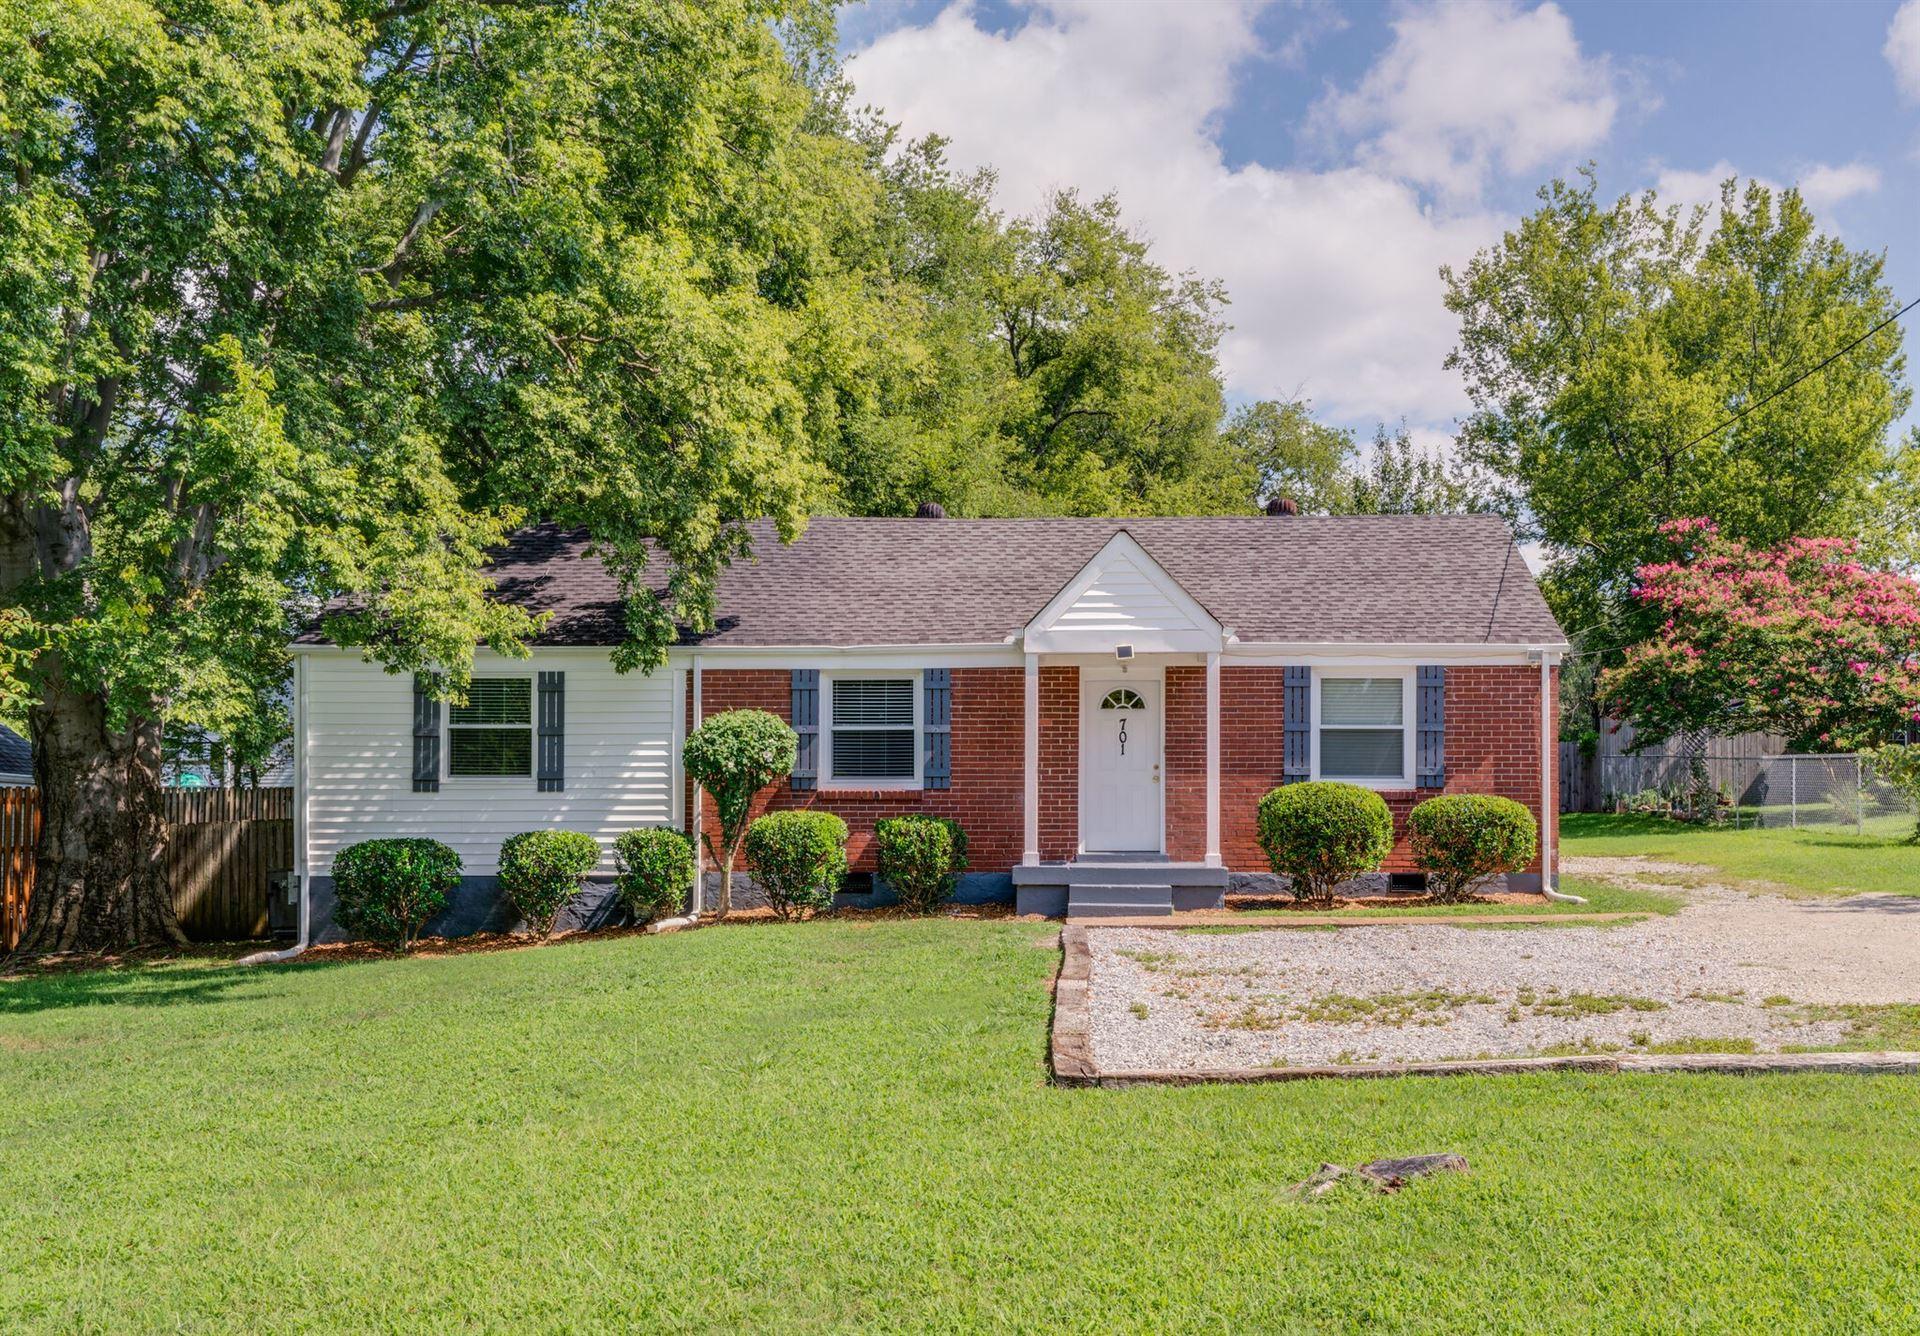 701 Blackstone Ave, Madison, TN 37115 - MLS#: 2178029